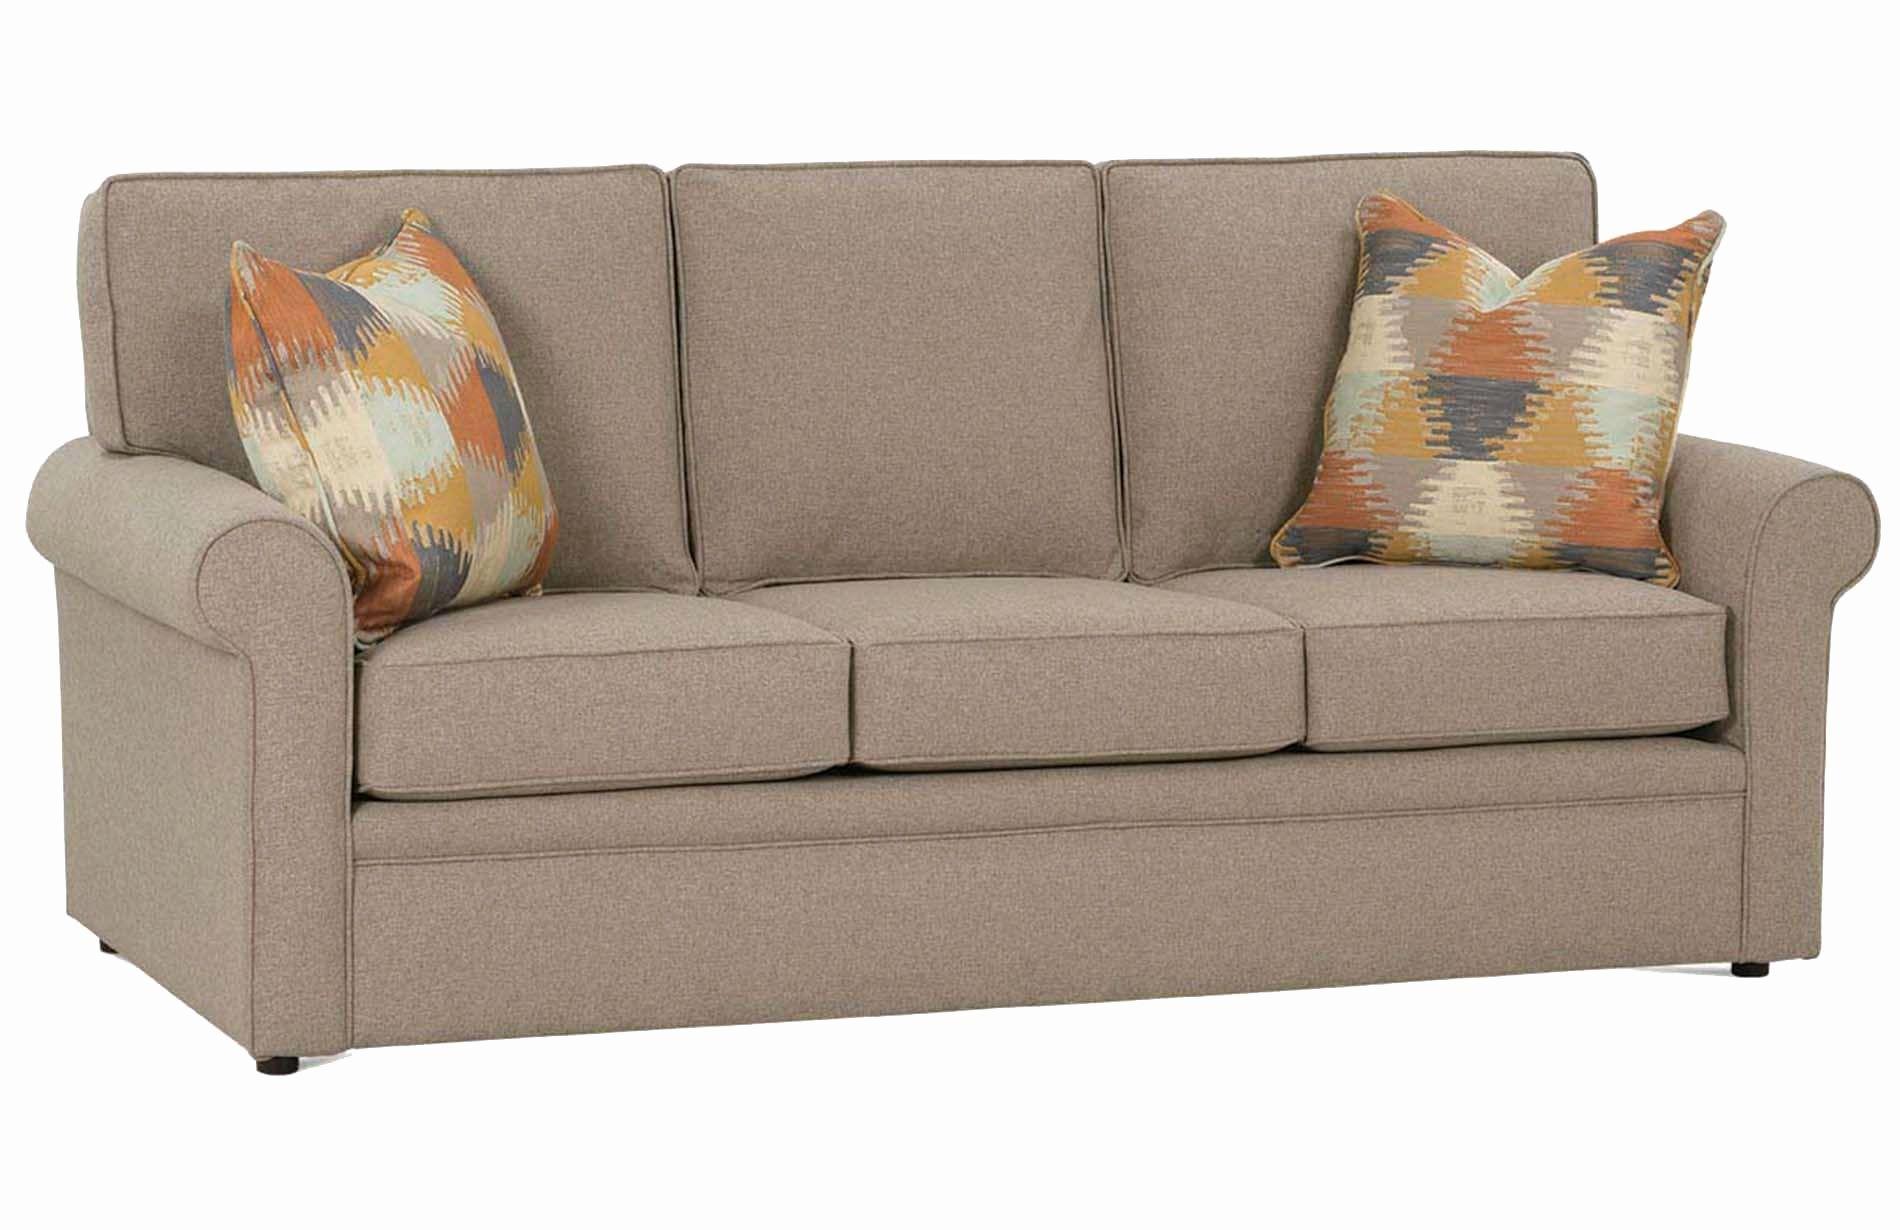 Idea Rowe Sleeper Sofa Pics 52 Unfor Table Photo Design Sofas